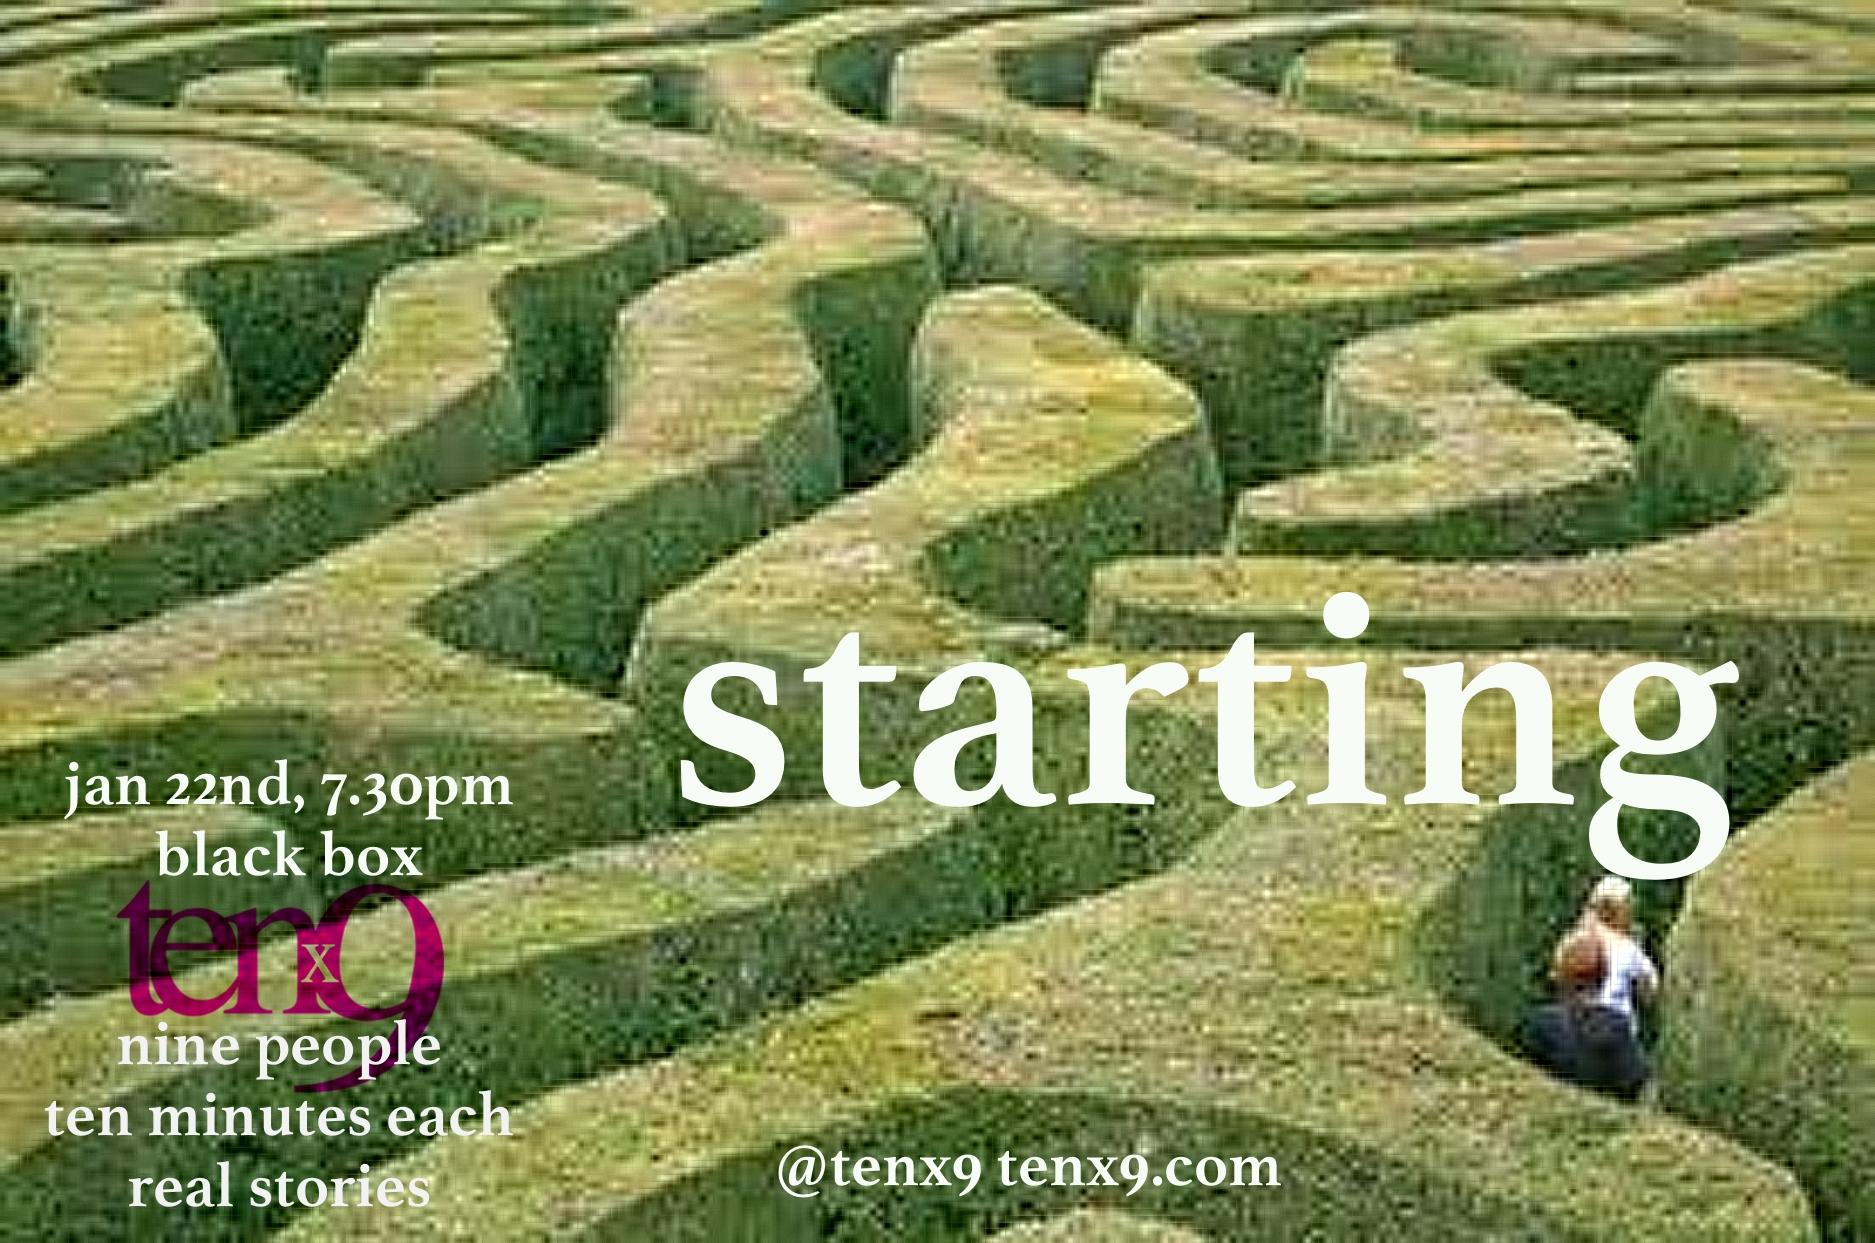 Tenx9 Jan 22nd, 7.30pm, Black Box, Starting.